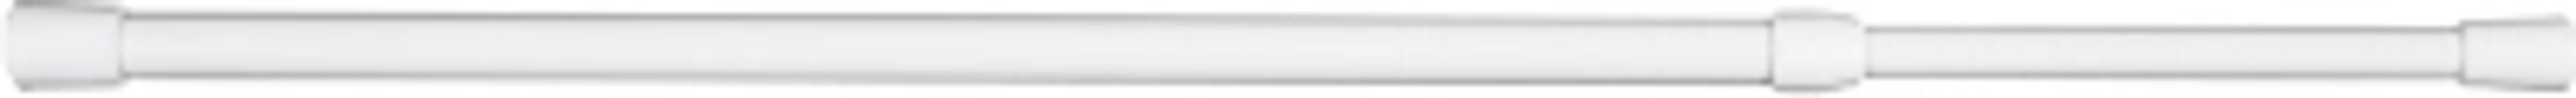 John Lewis & Partners Tension Net Rod